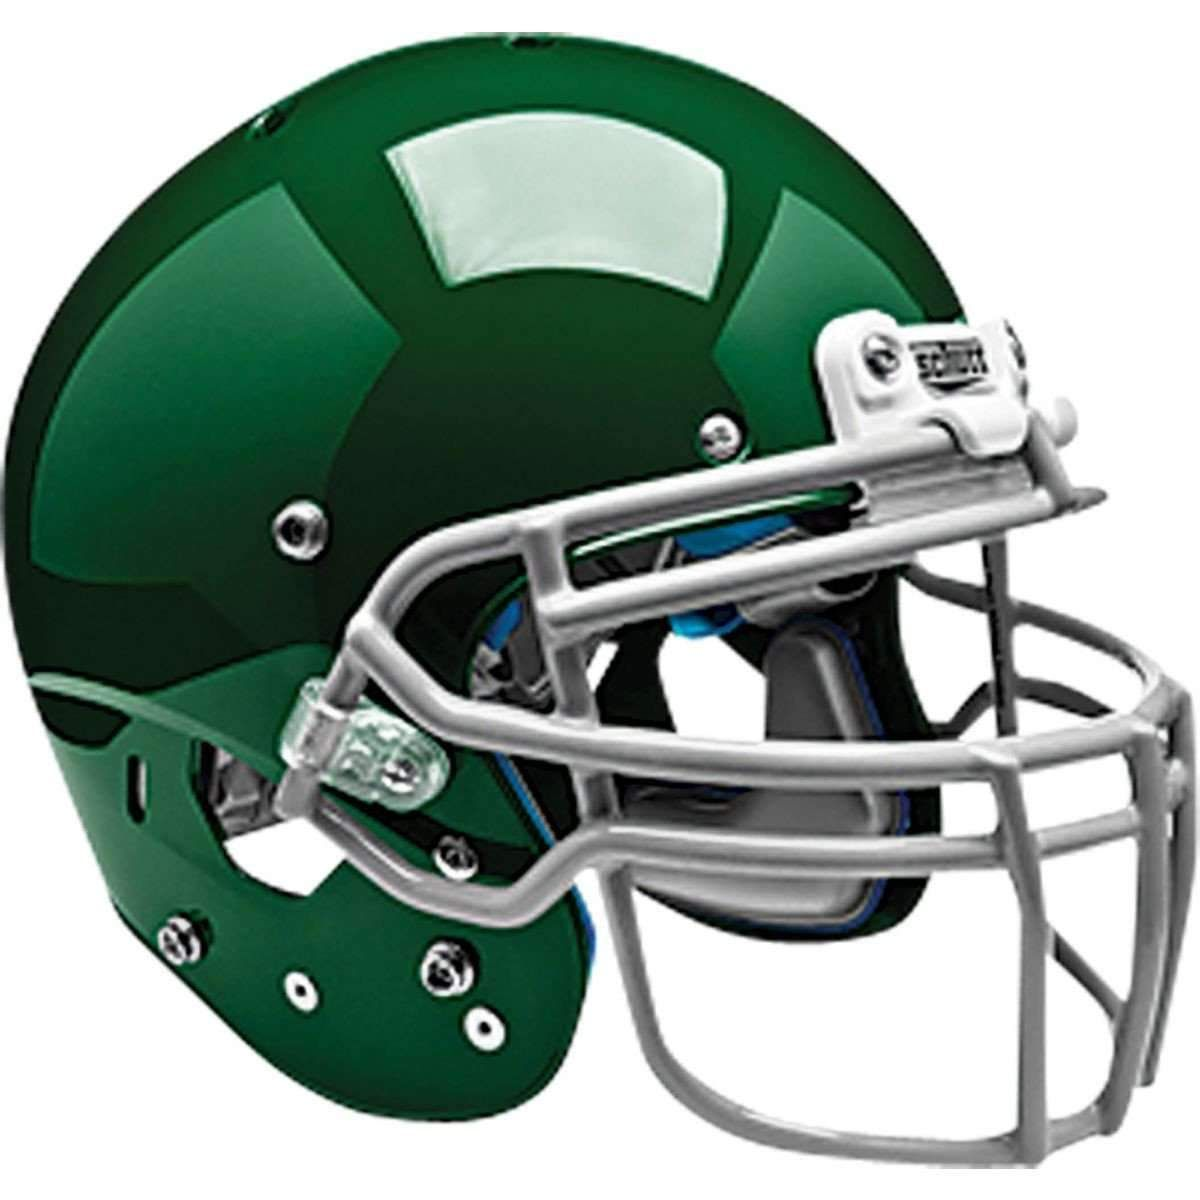 1559afe1 Schutt Adult Air XP Pro VTD Football Helmet | Products | Football ...